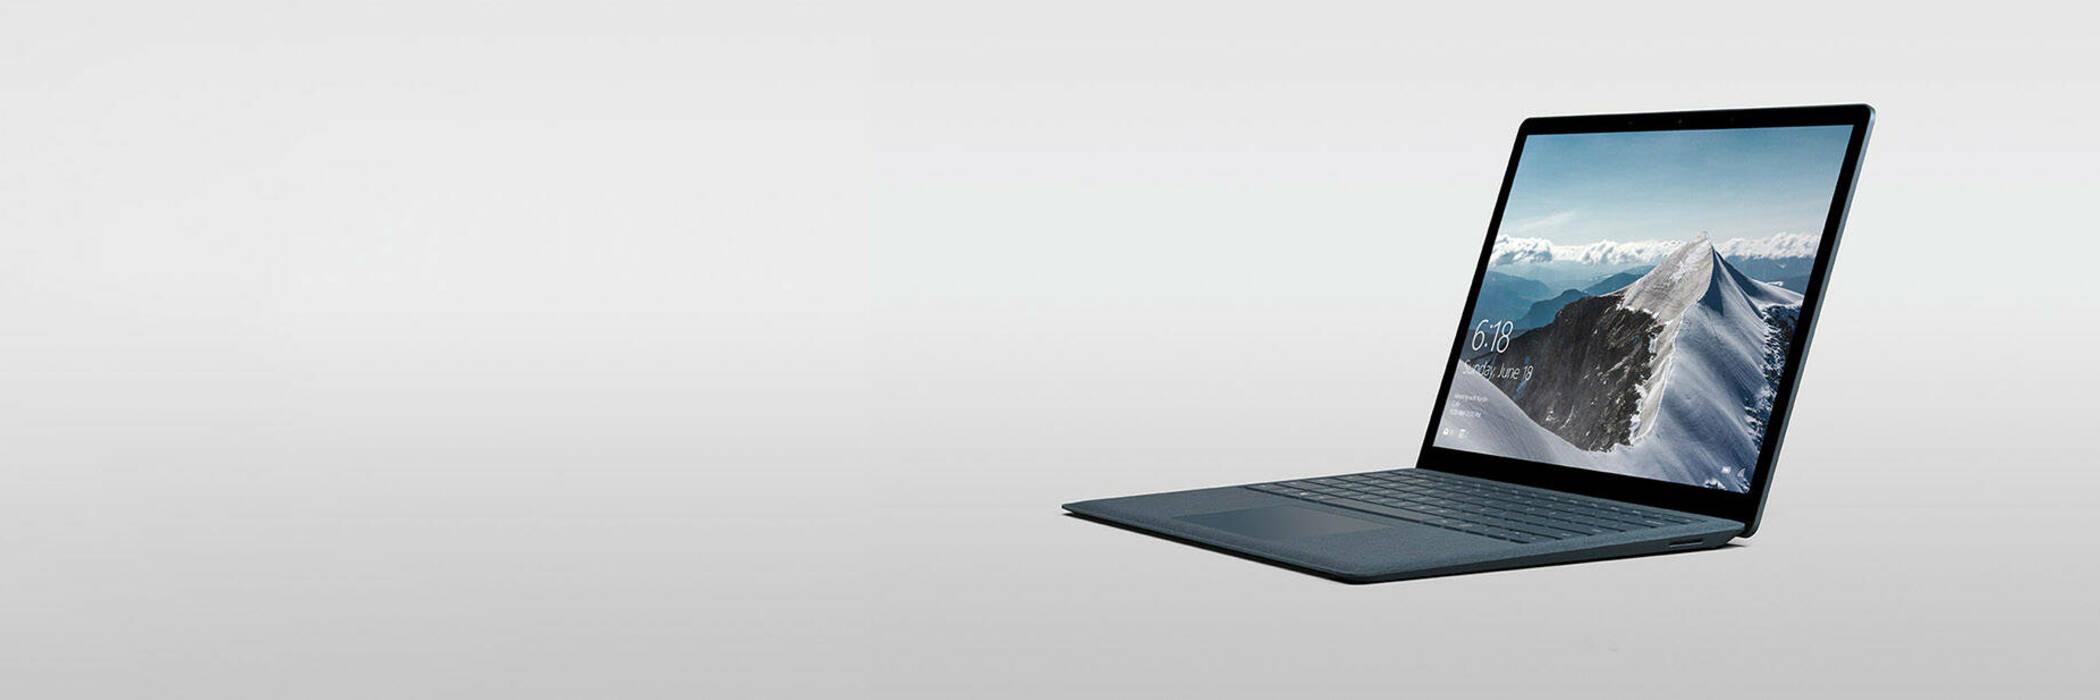 Surface Laptop in Cobalt Blue